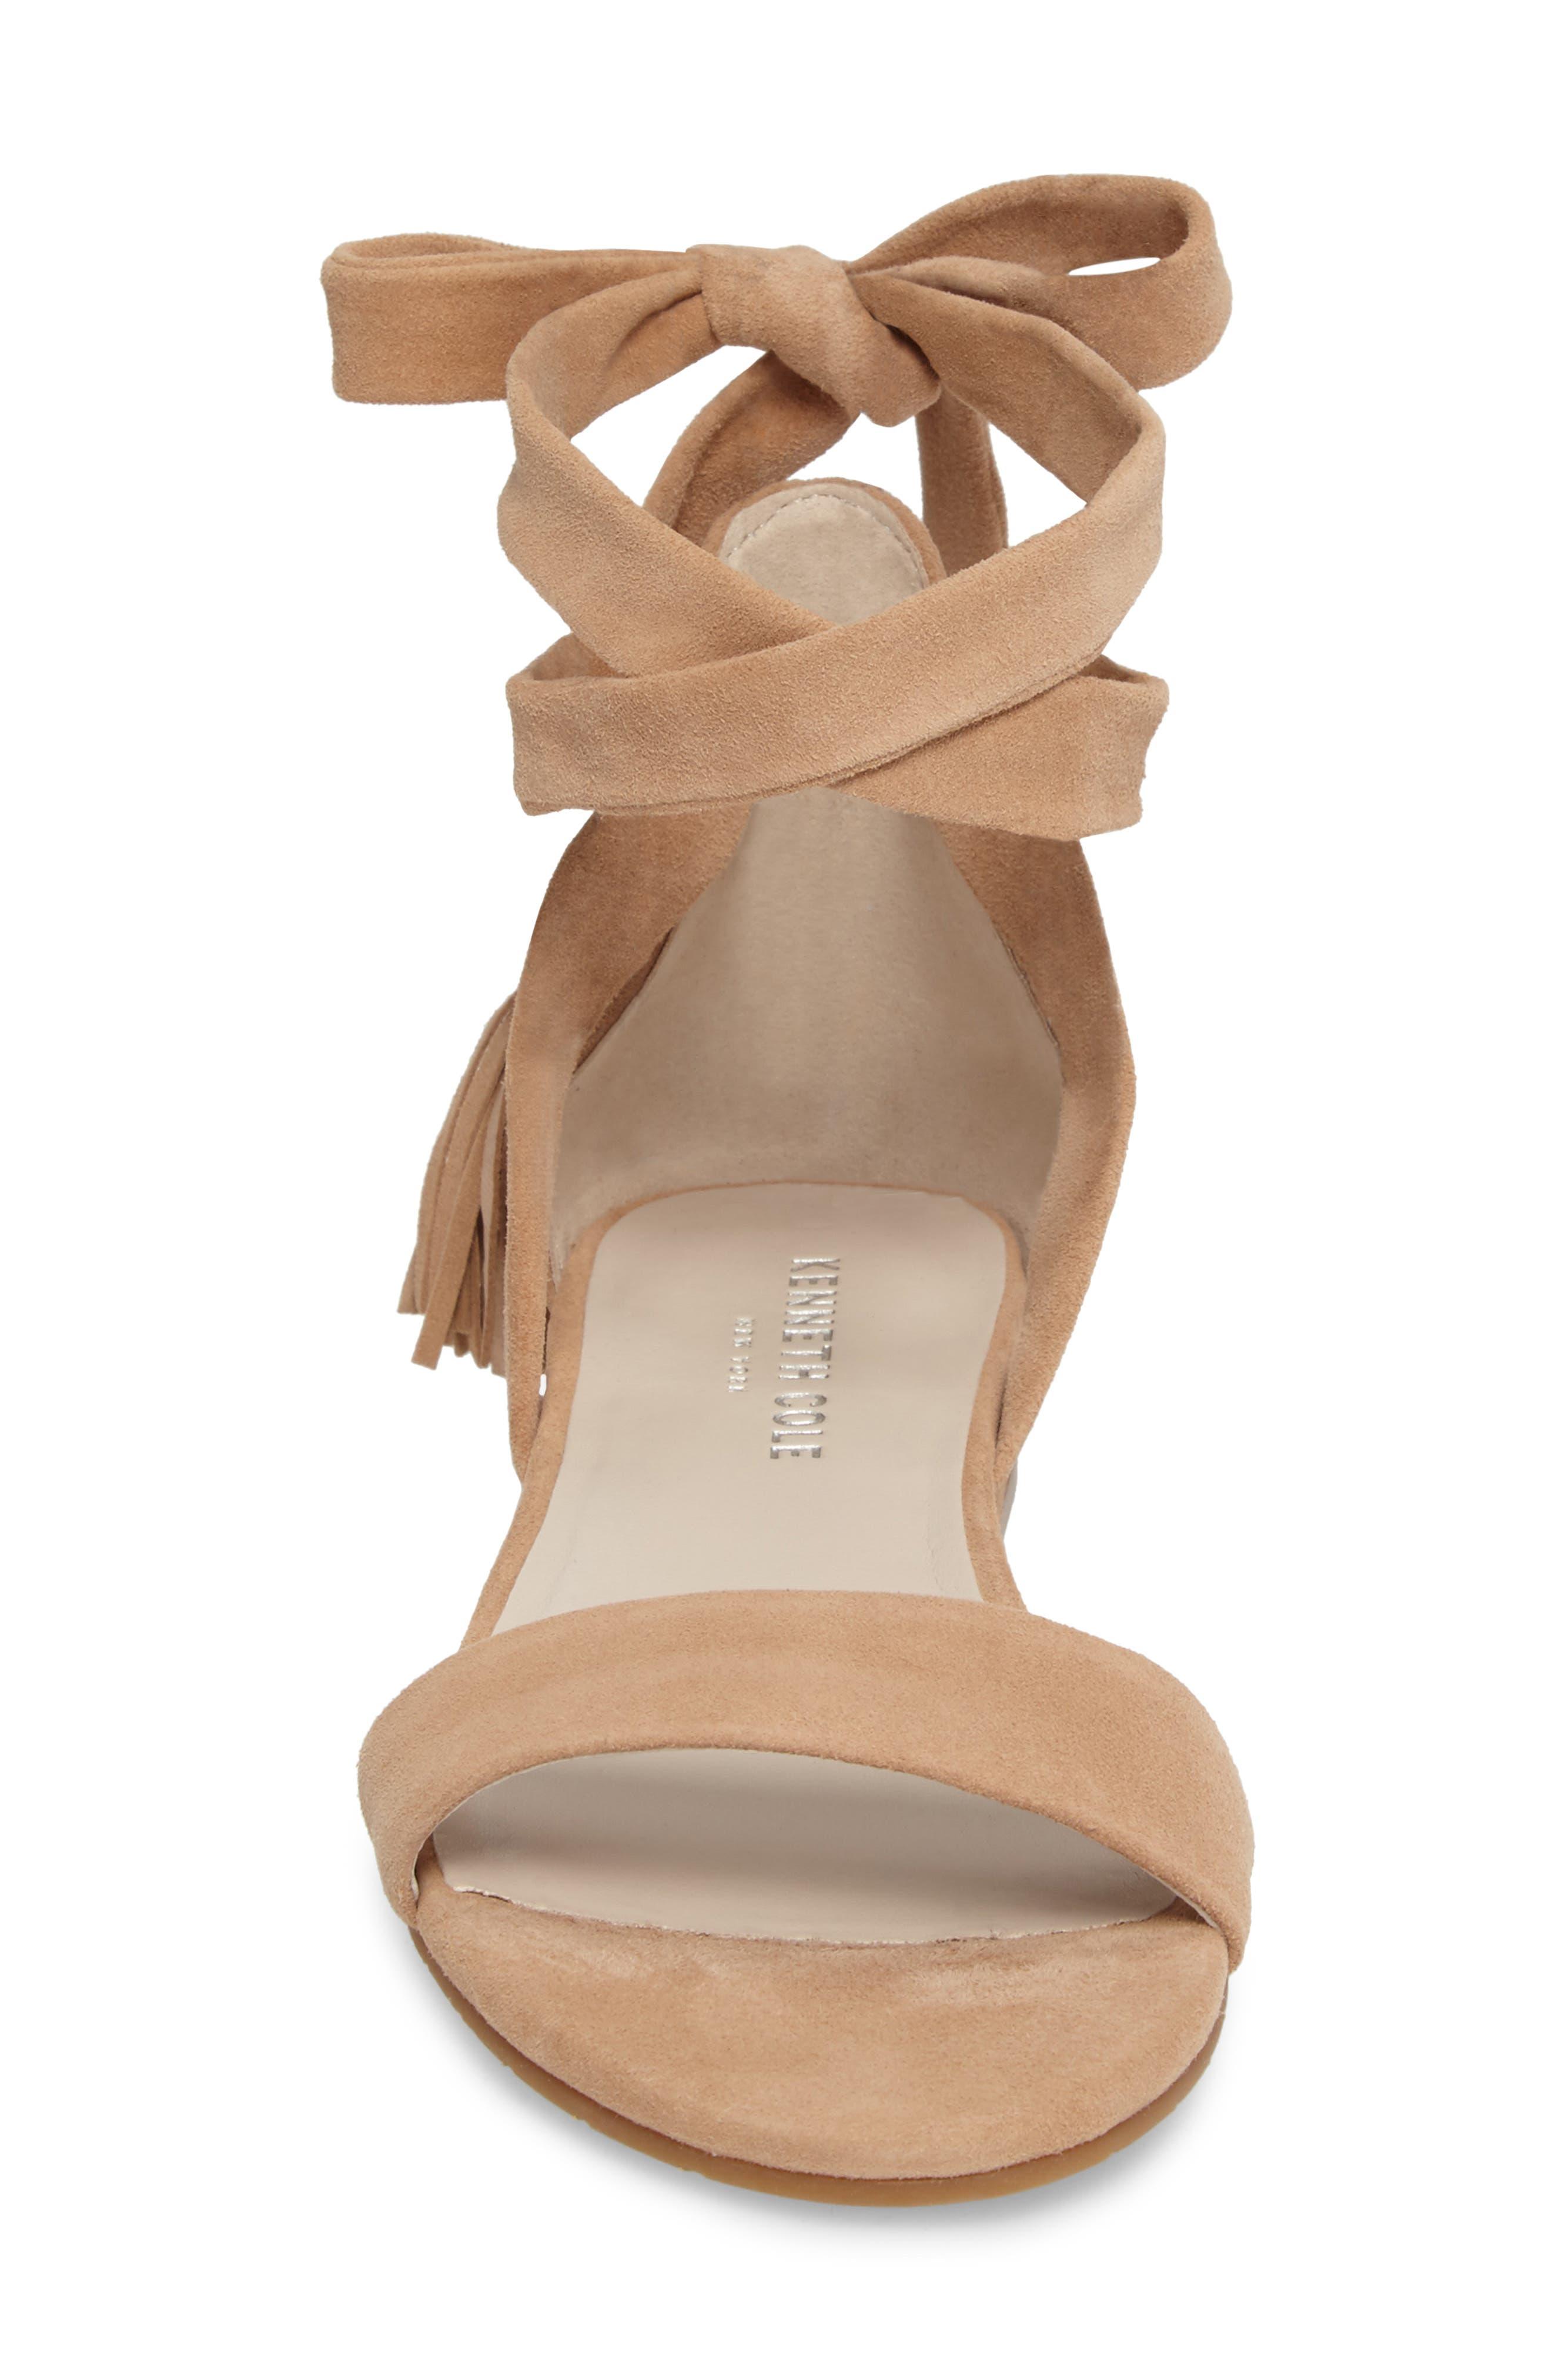 Valen Tassel Lace-Up Sandal,                             Alternate thumbnail 48, color,